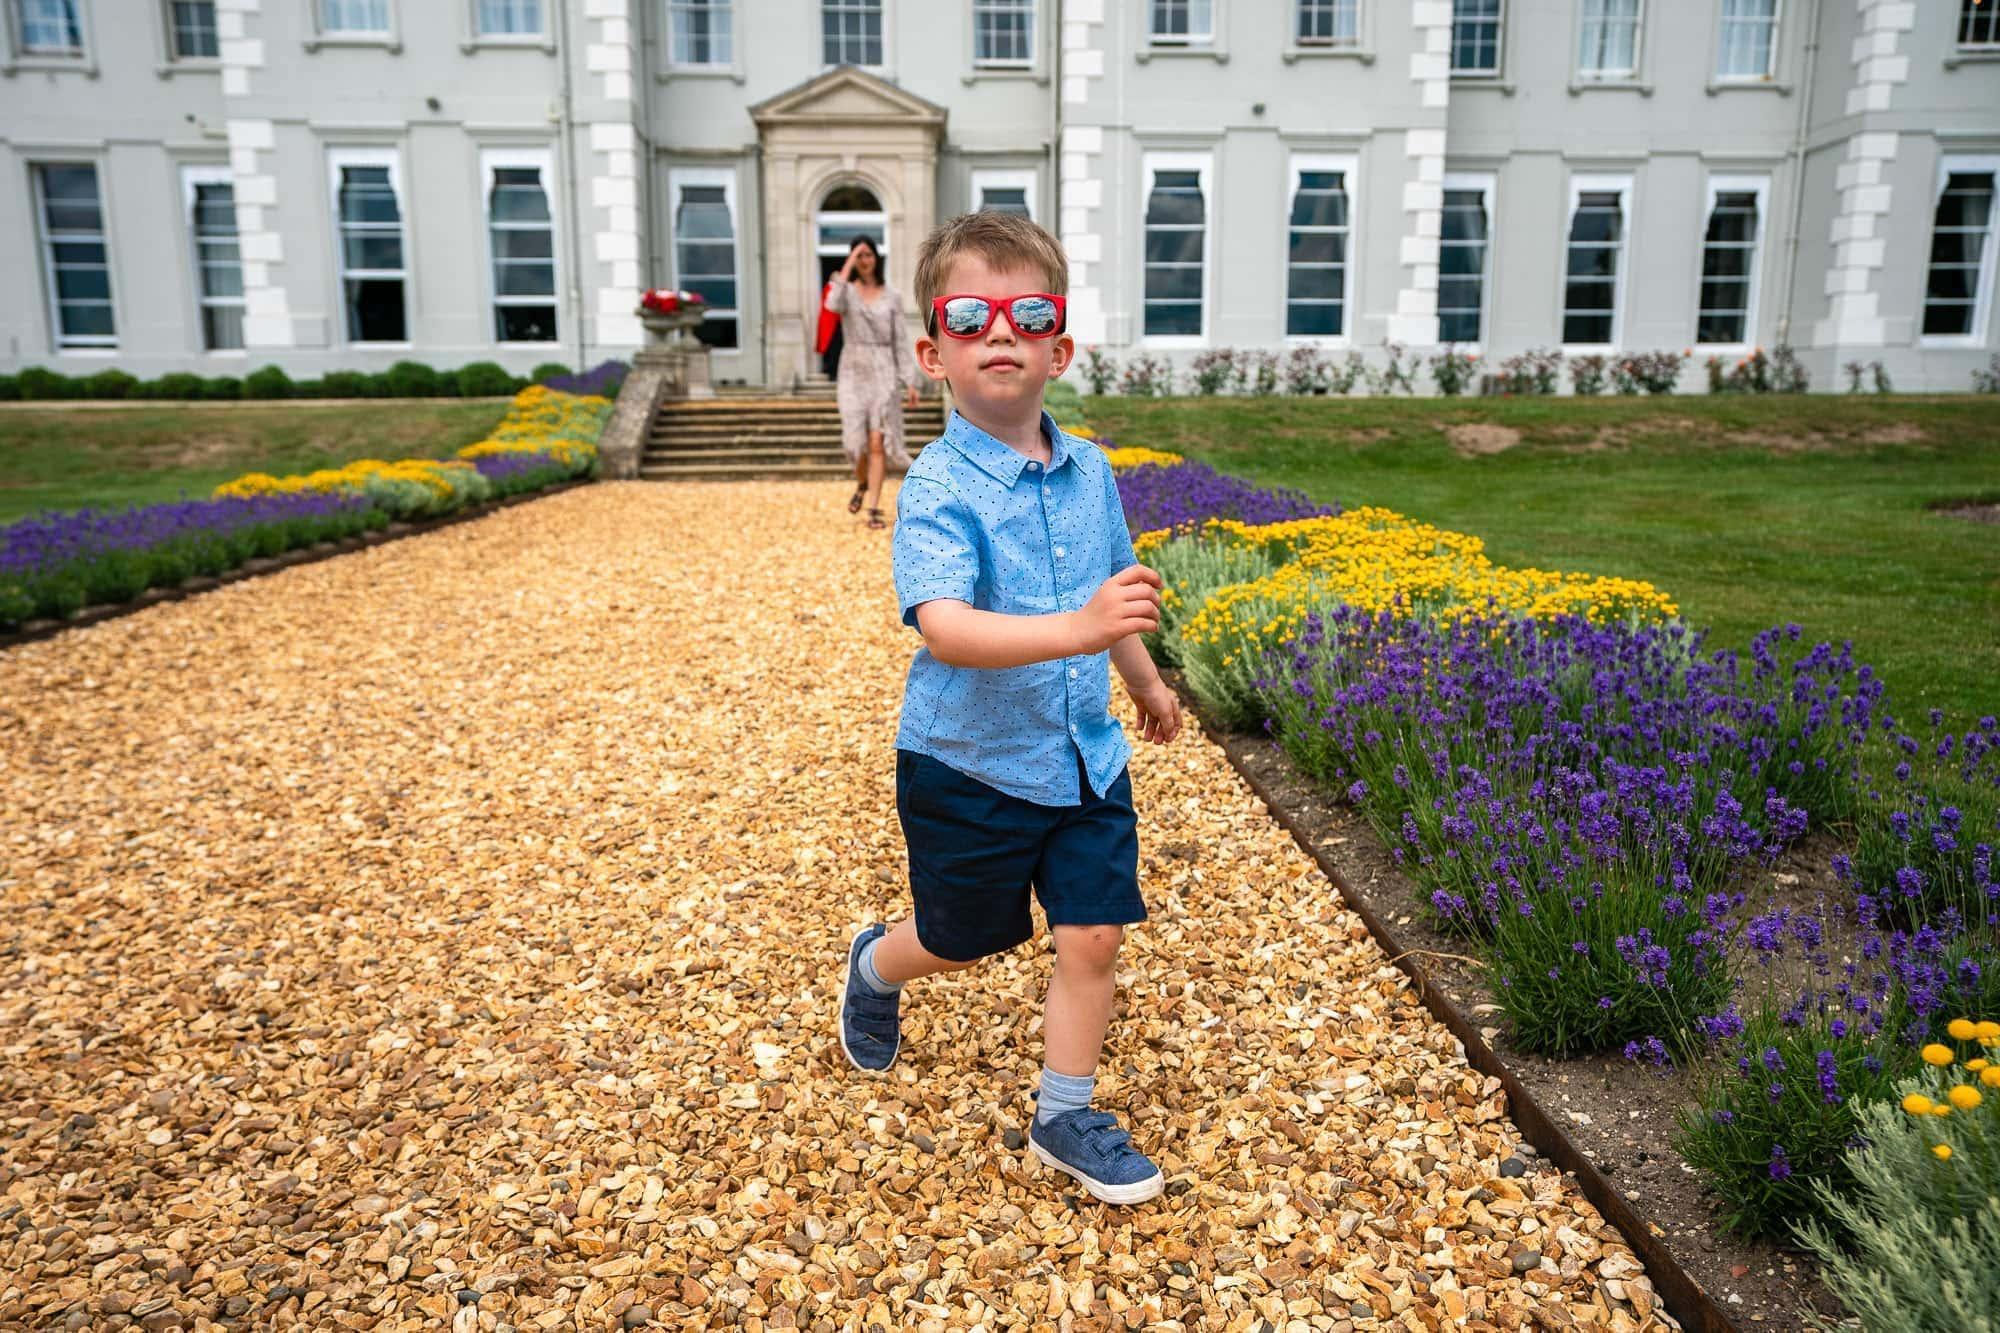 Kid in Sunglasses - De Vere Wokefield Estate